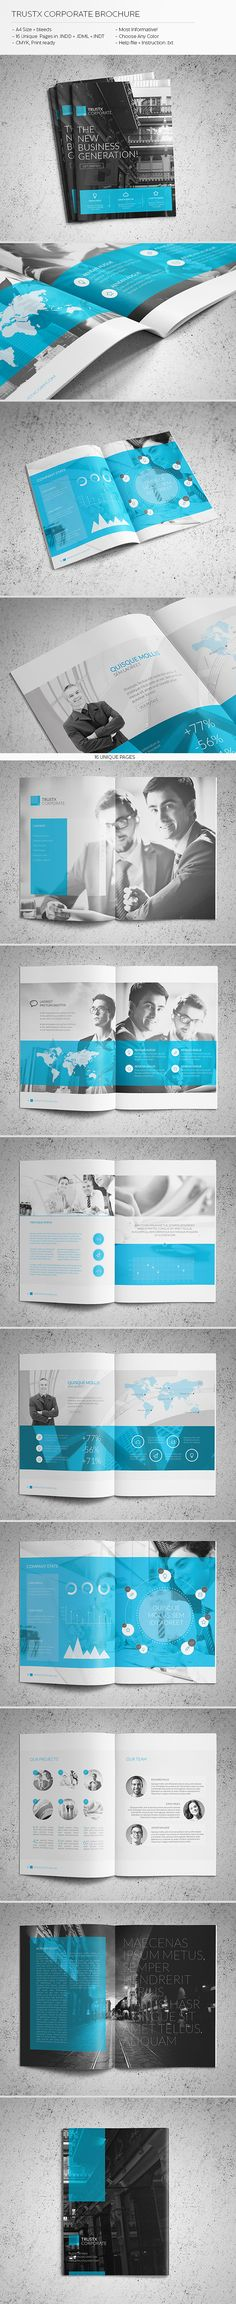 Trustx Corporate Brochure inShare Realstar's Portfolio Novopolotsk, Belarus